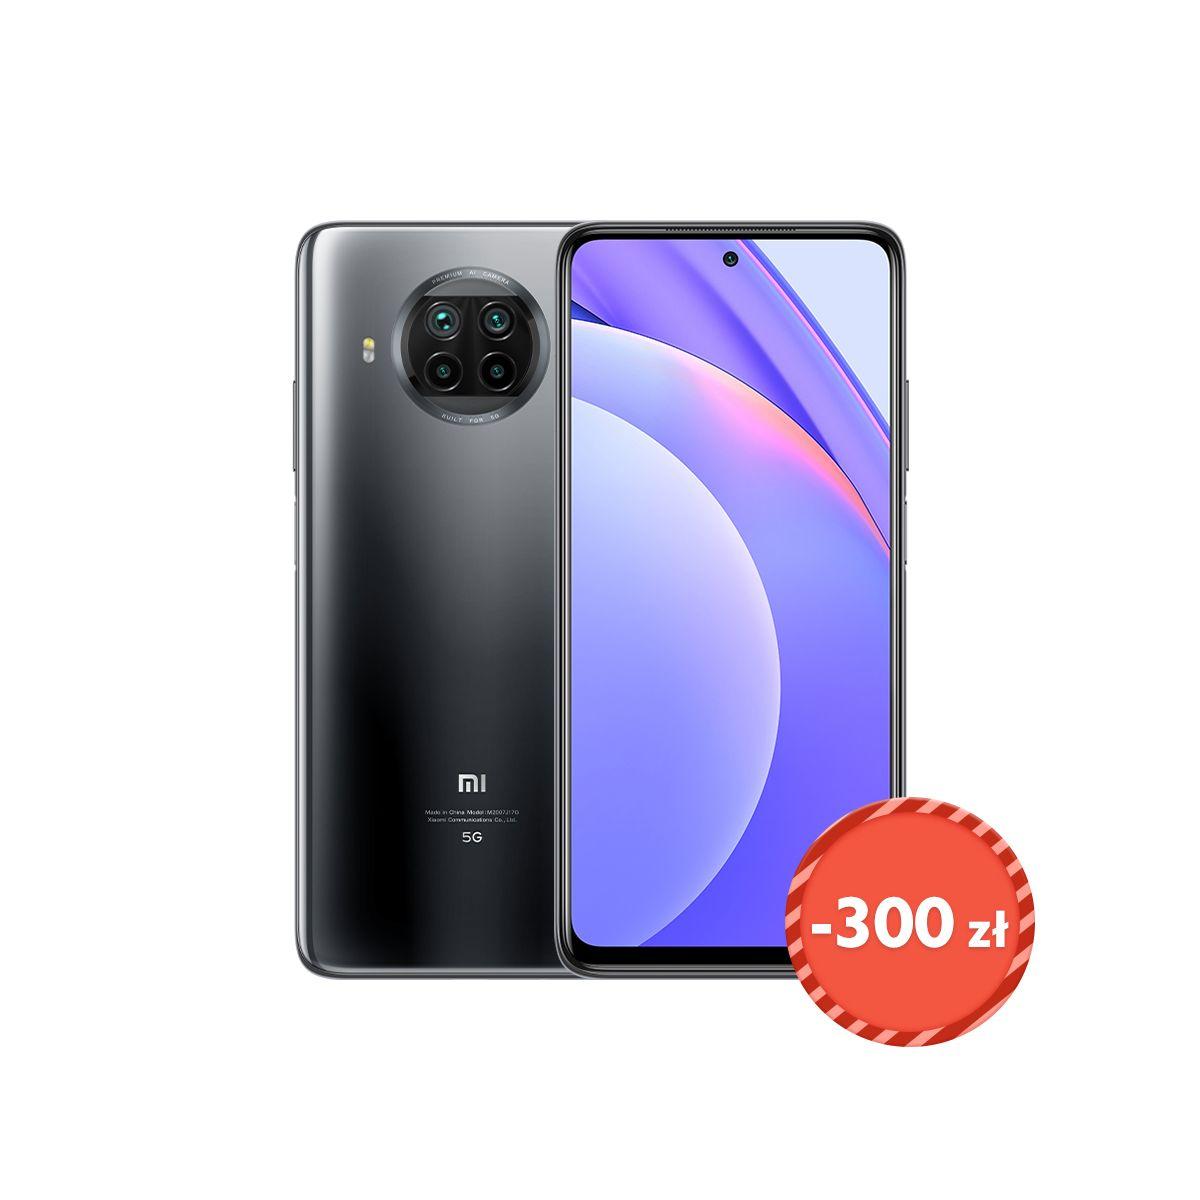 Smartfon Mi 10T Lite 5G 6/128GB z kodem i obniżką na mi-home.pl